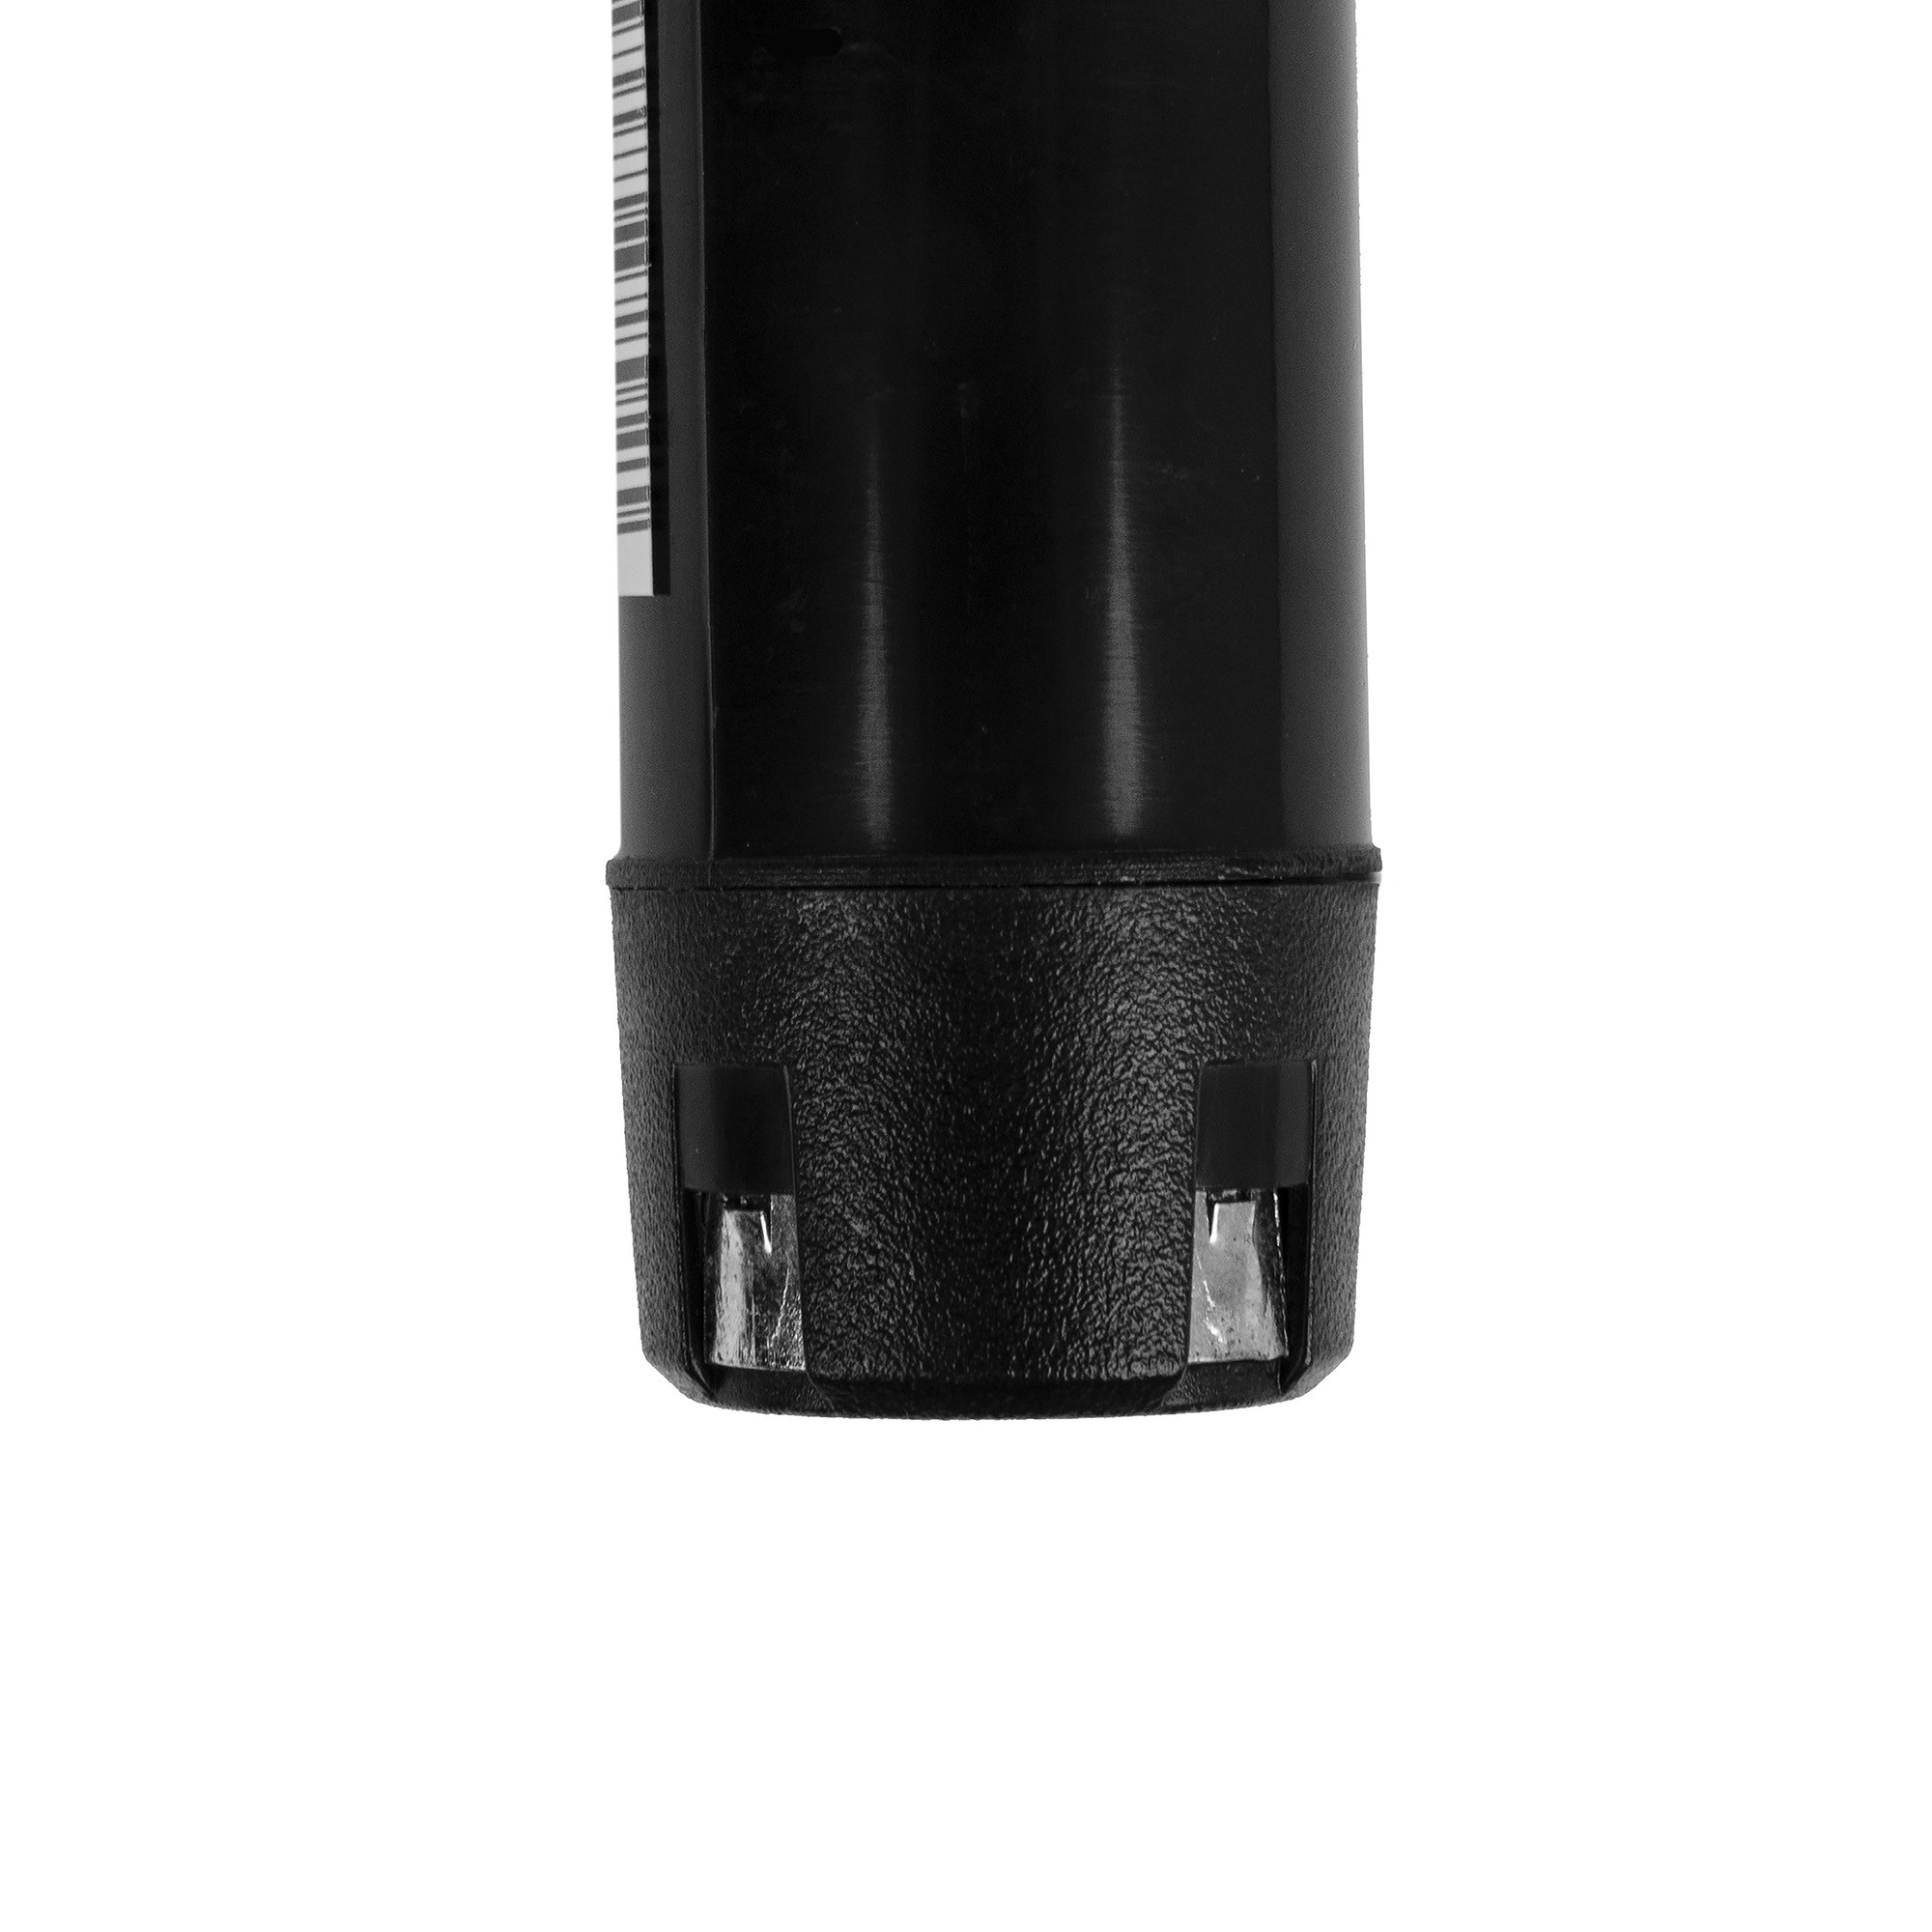 Green Cell Power Tool Battery AP4001 AP4003 for Ryobi HP53L HP54L RP4000 RP4010 RP4020 RP4030 RP4401